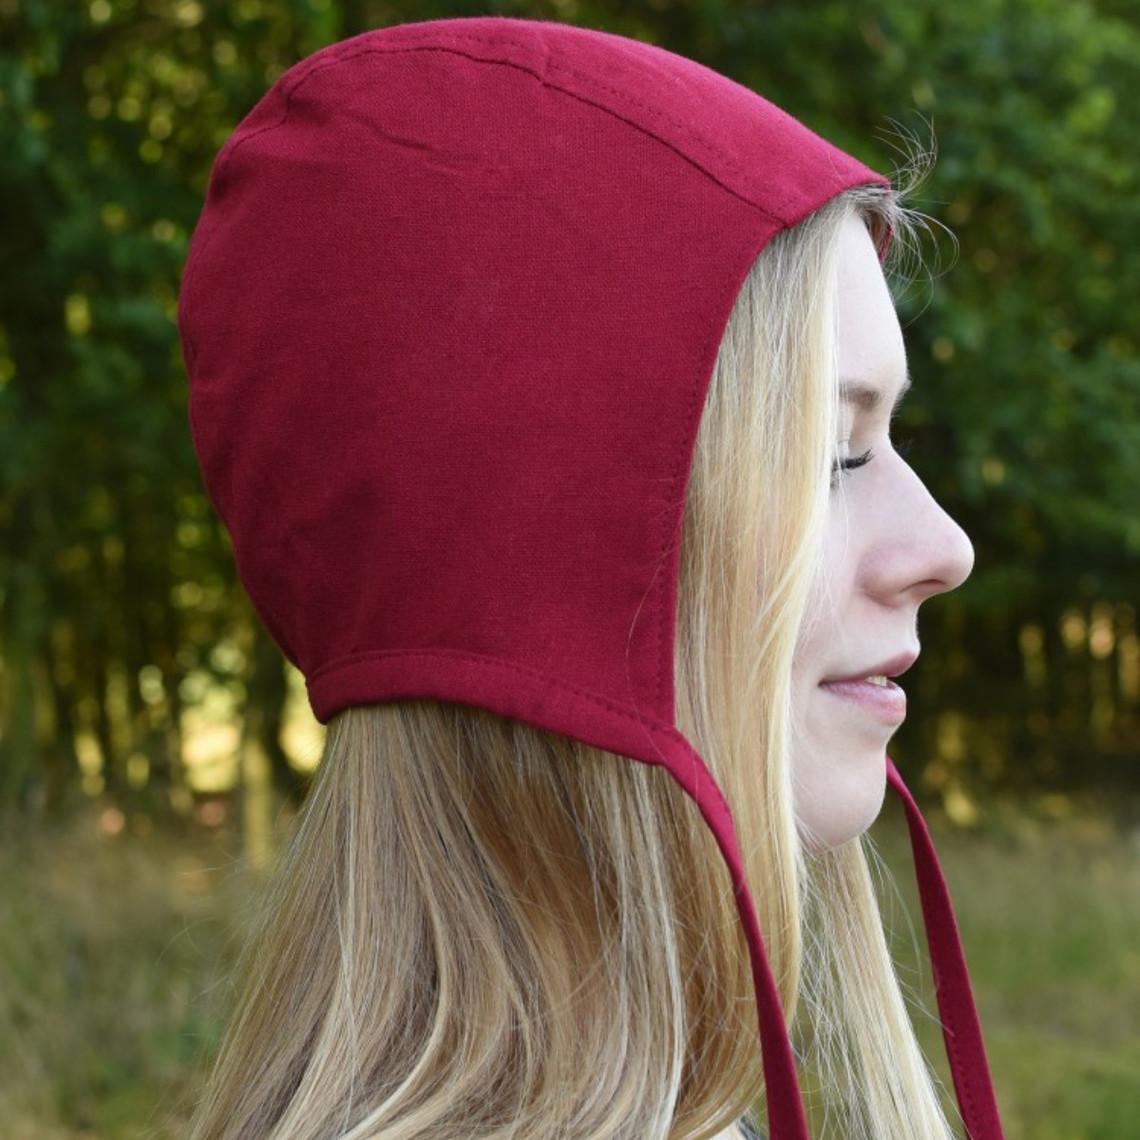 Middeleeuws-Renaissance kapje Gouda, rood